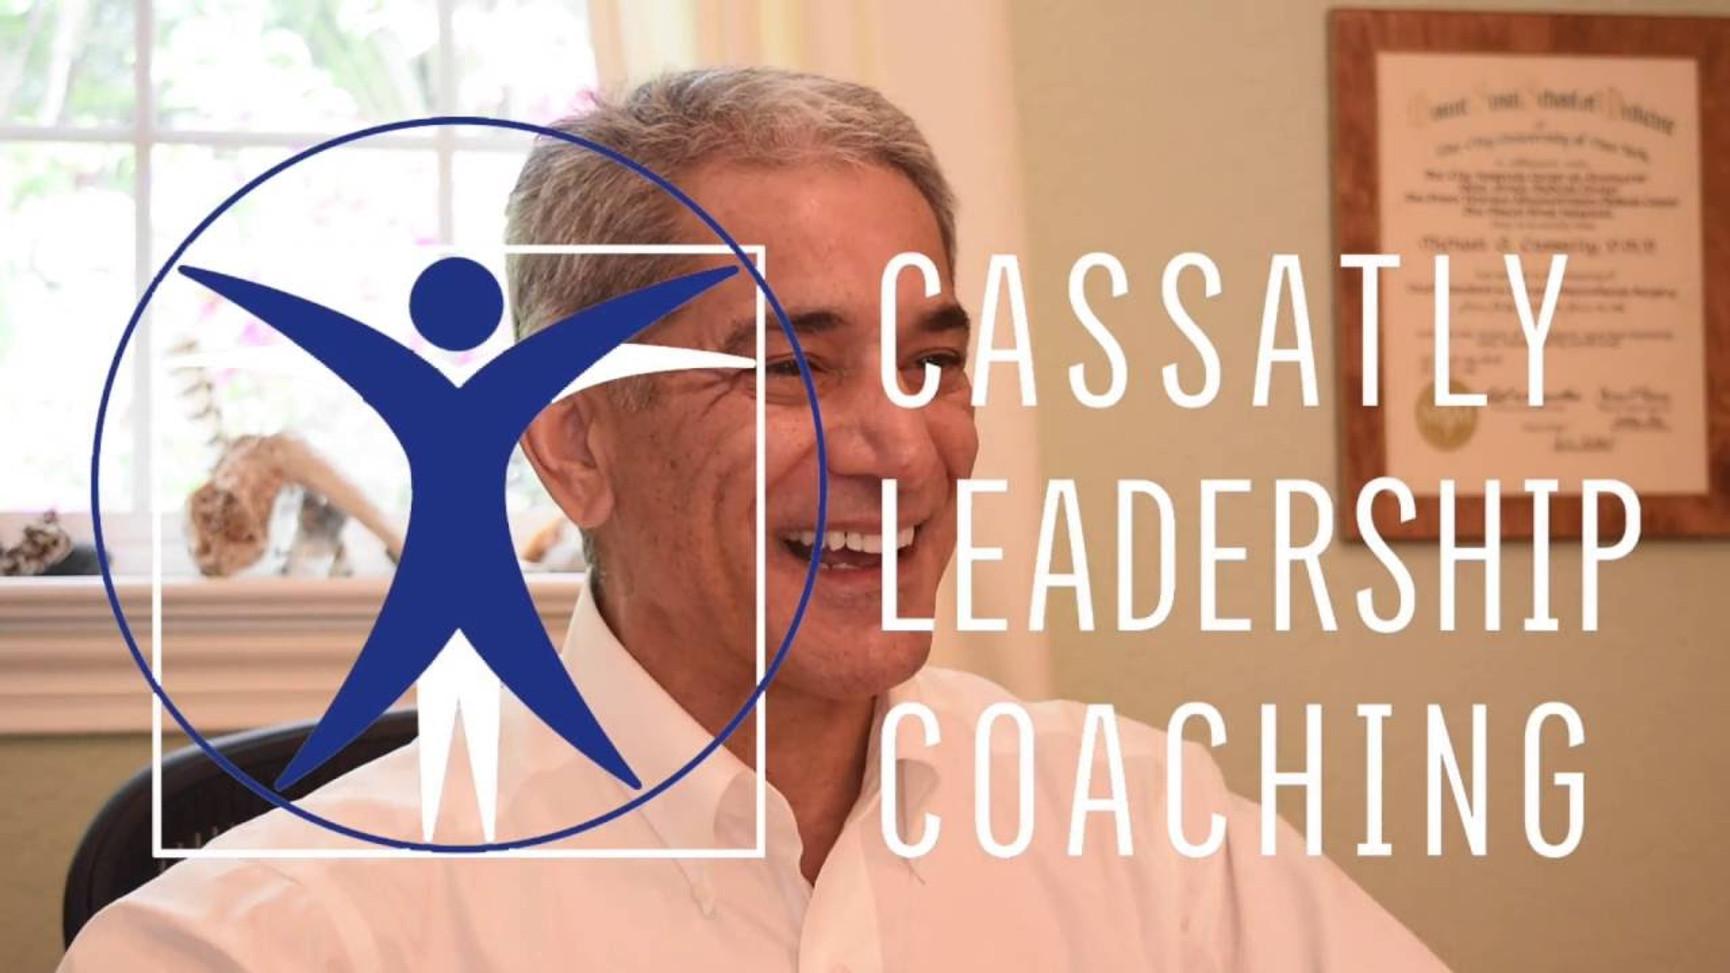 Cassatly Leadership Coaching